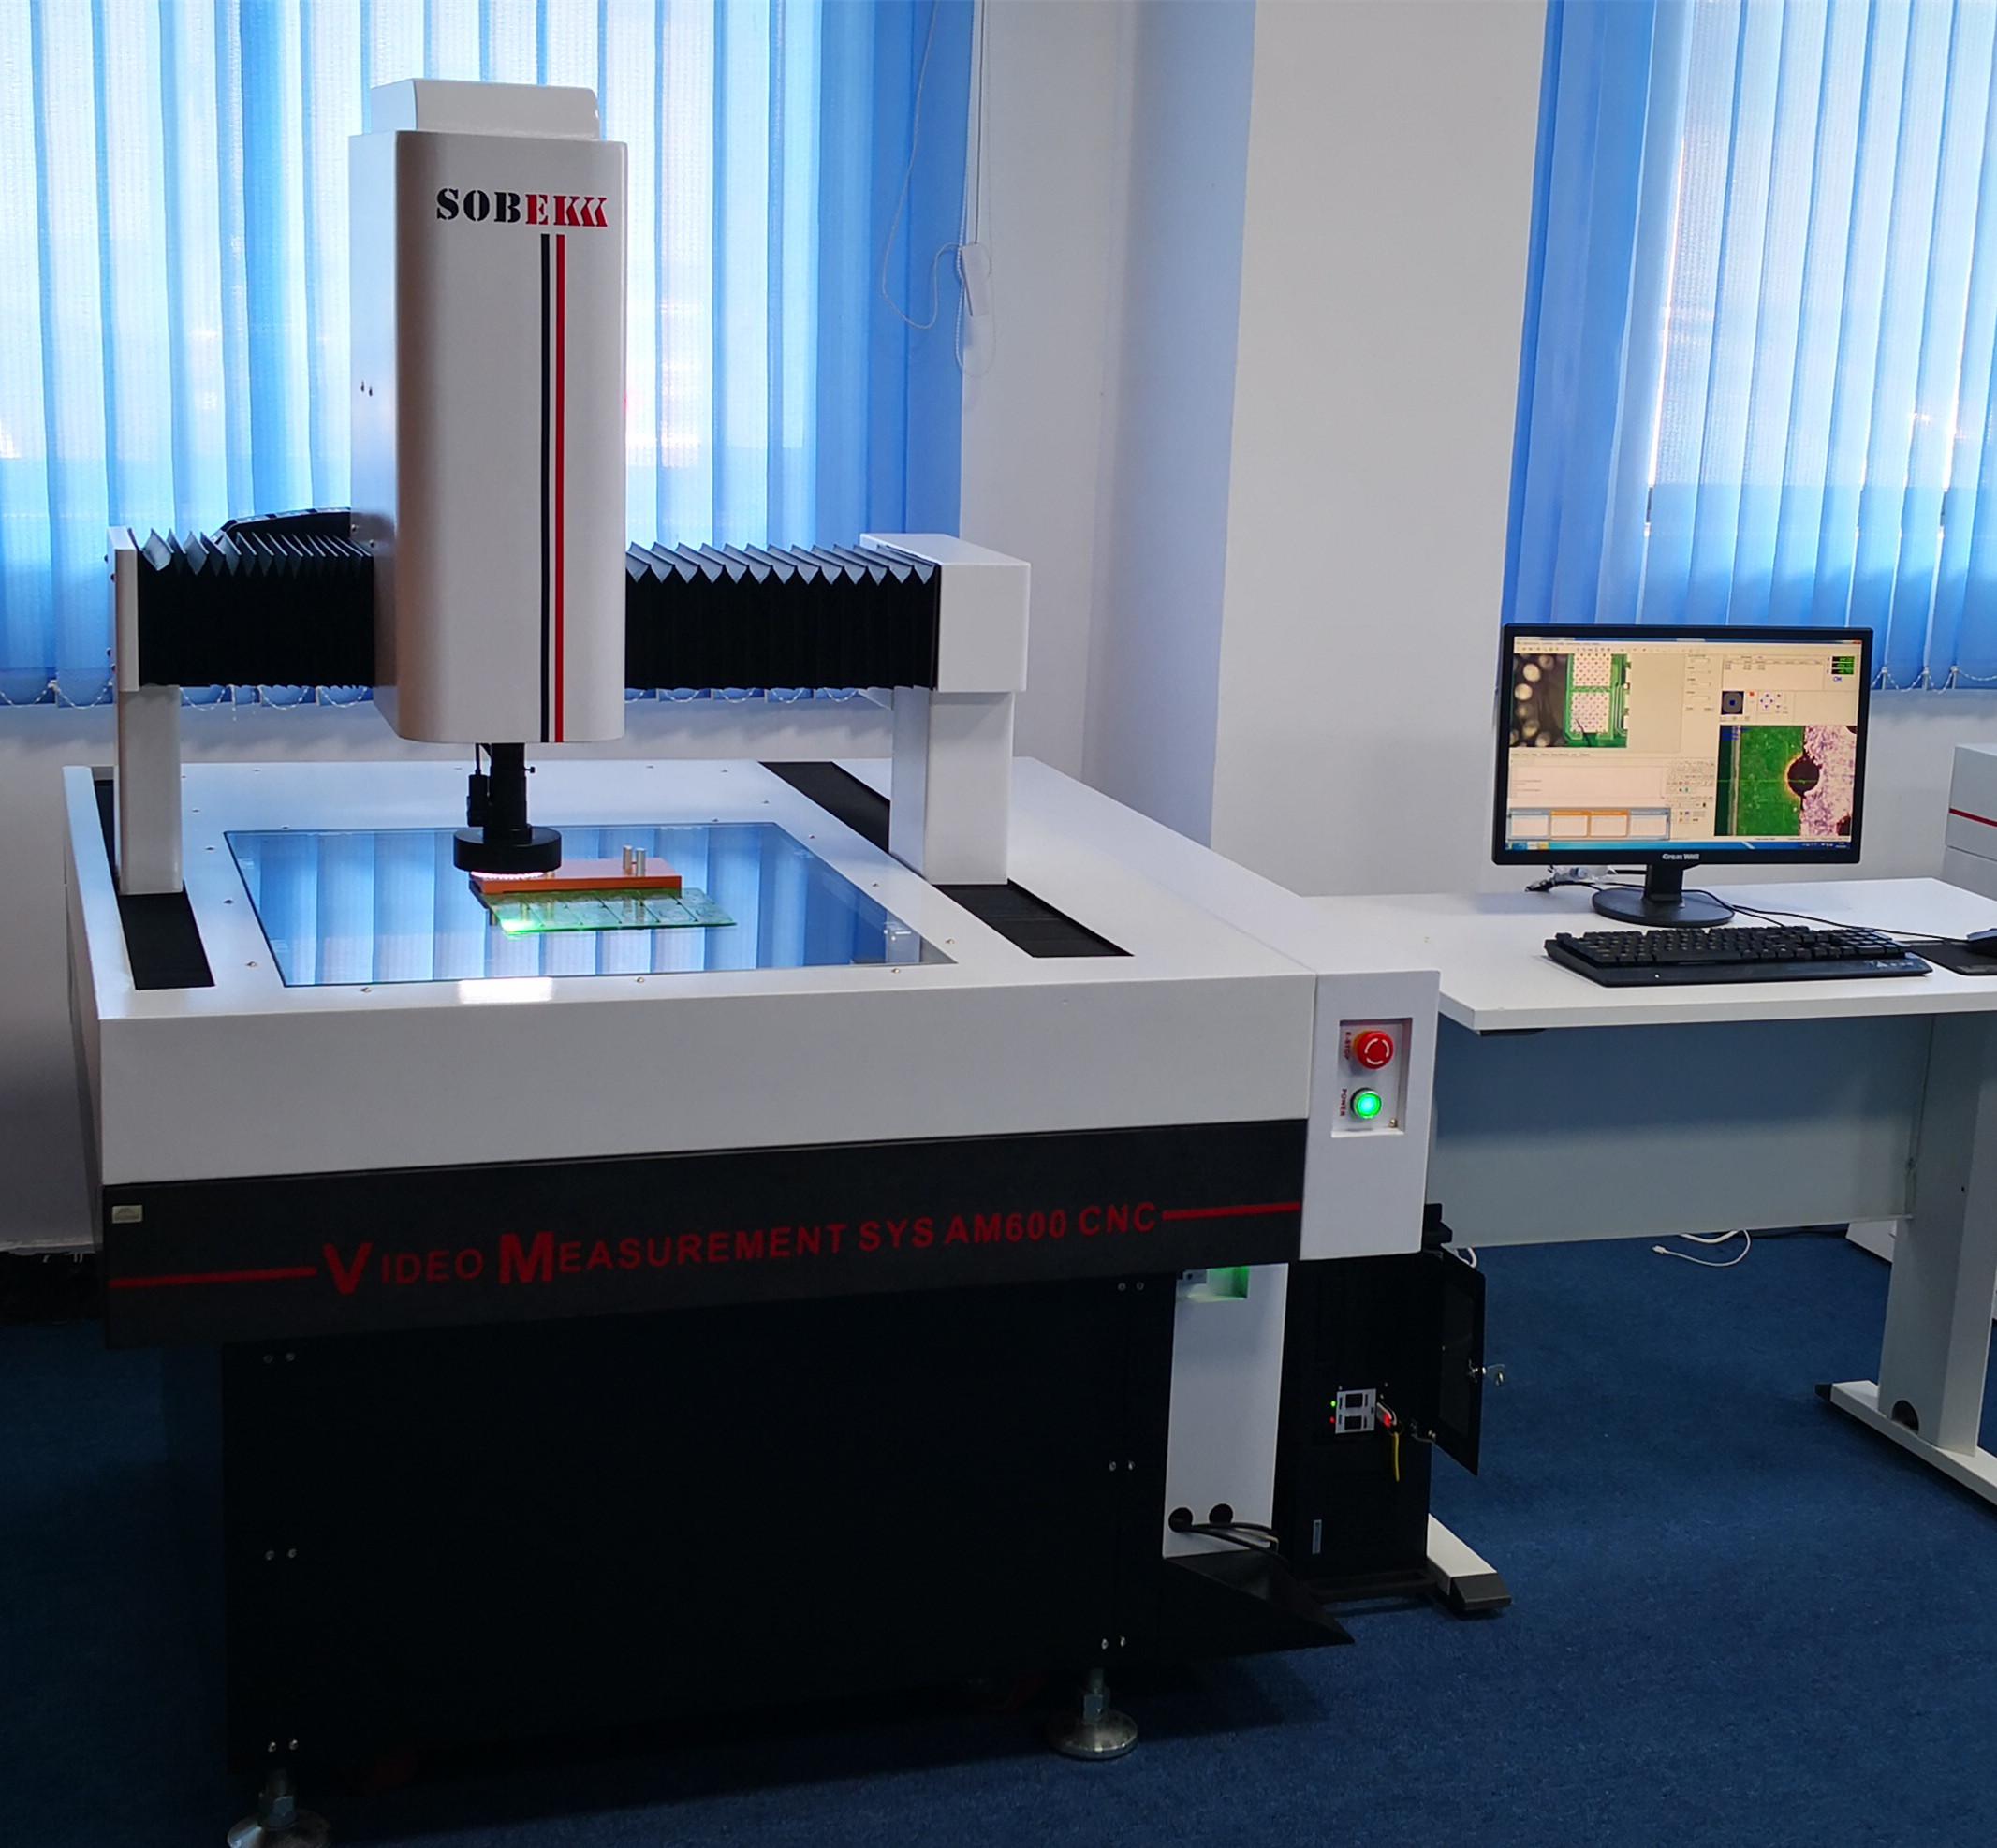 Bridge Style CNC Video Measuring Machine